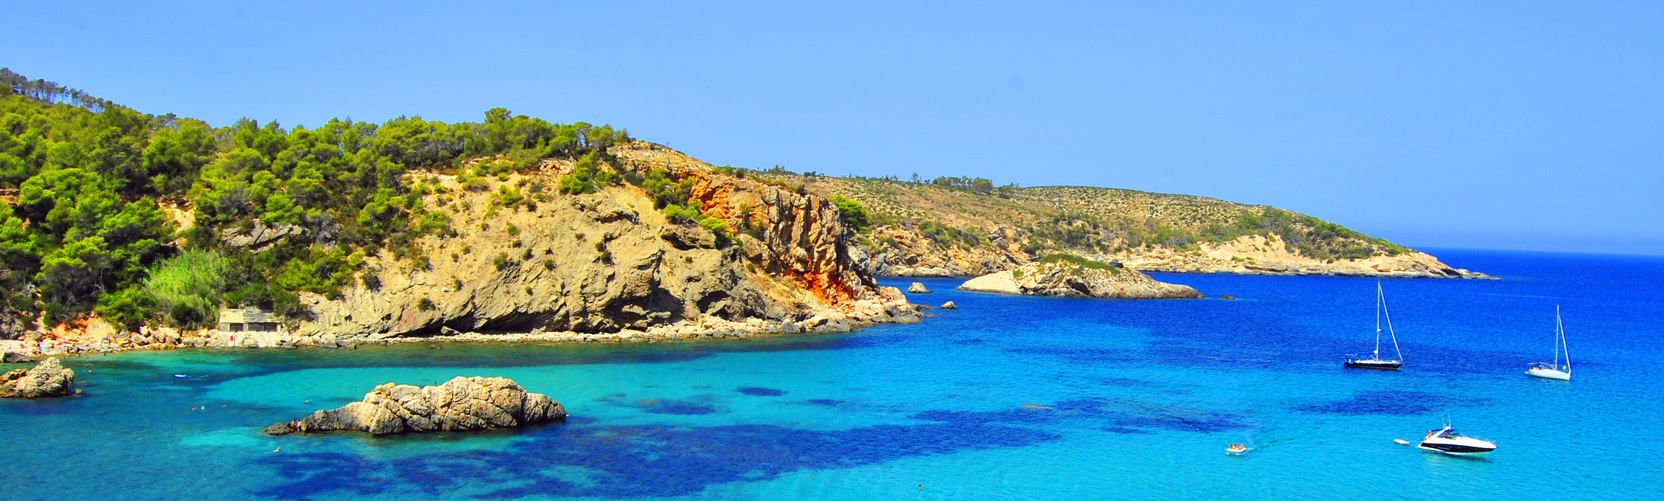 Formentera - wyspa na Balearach